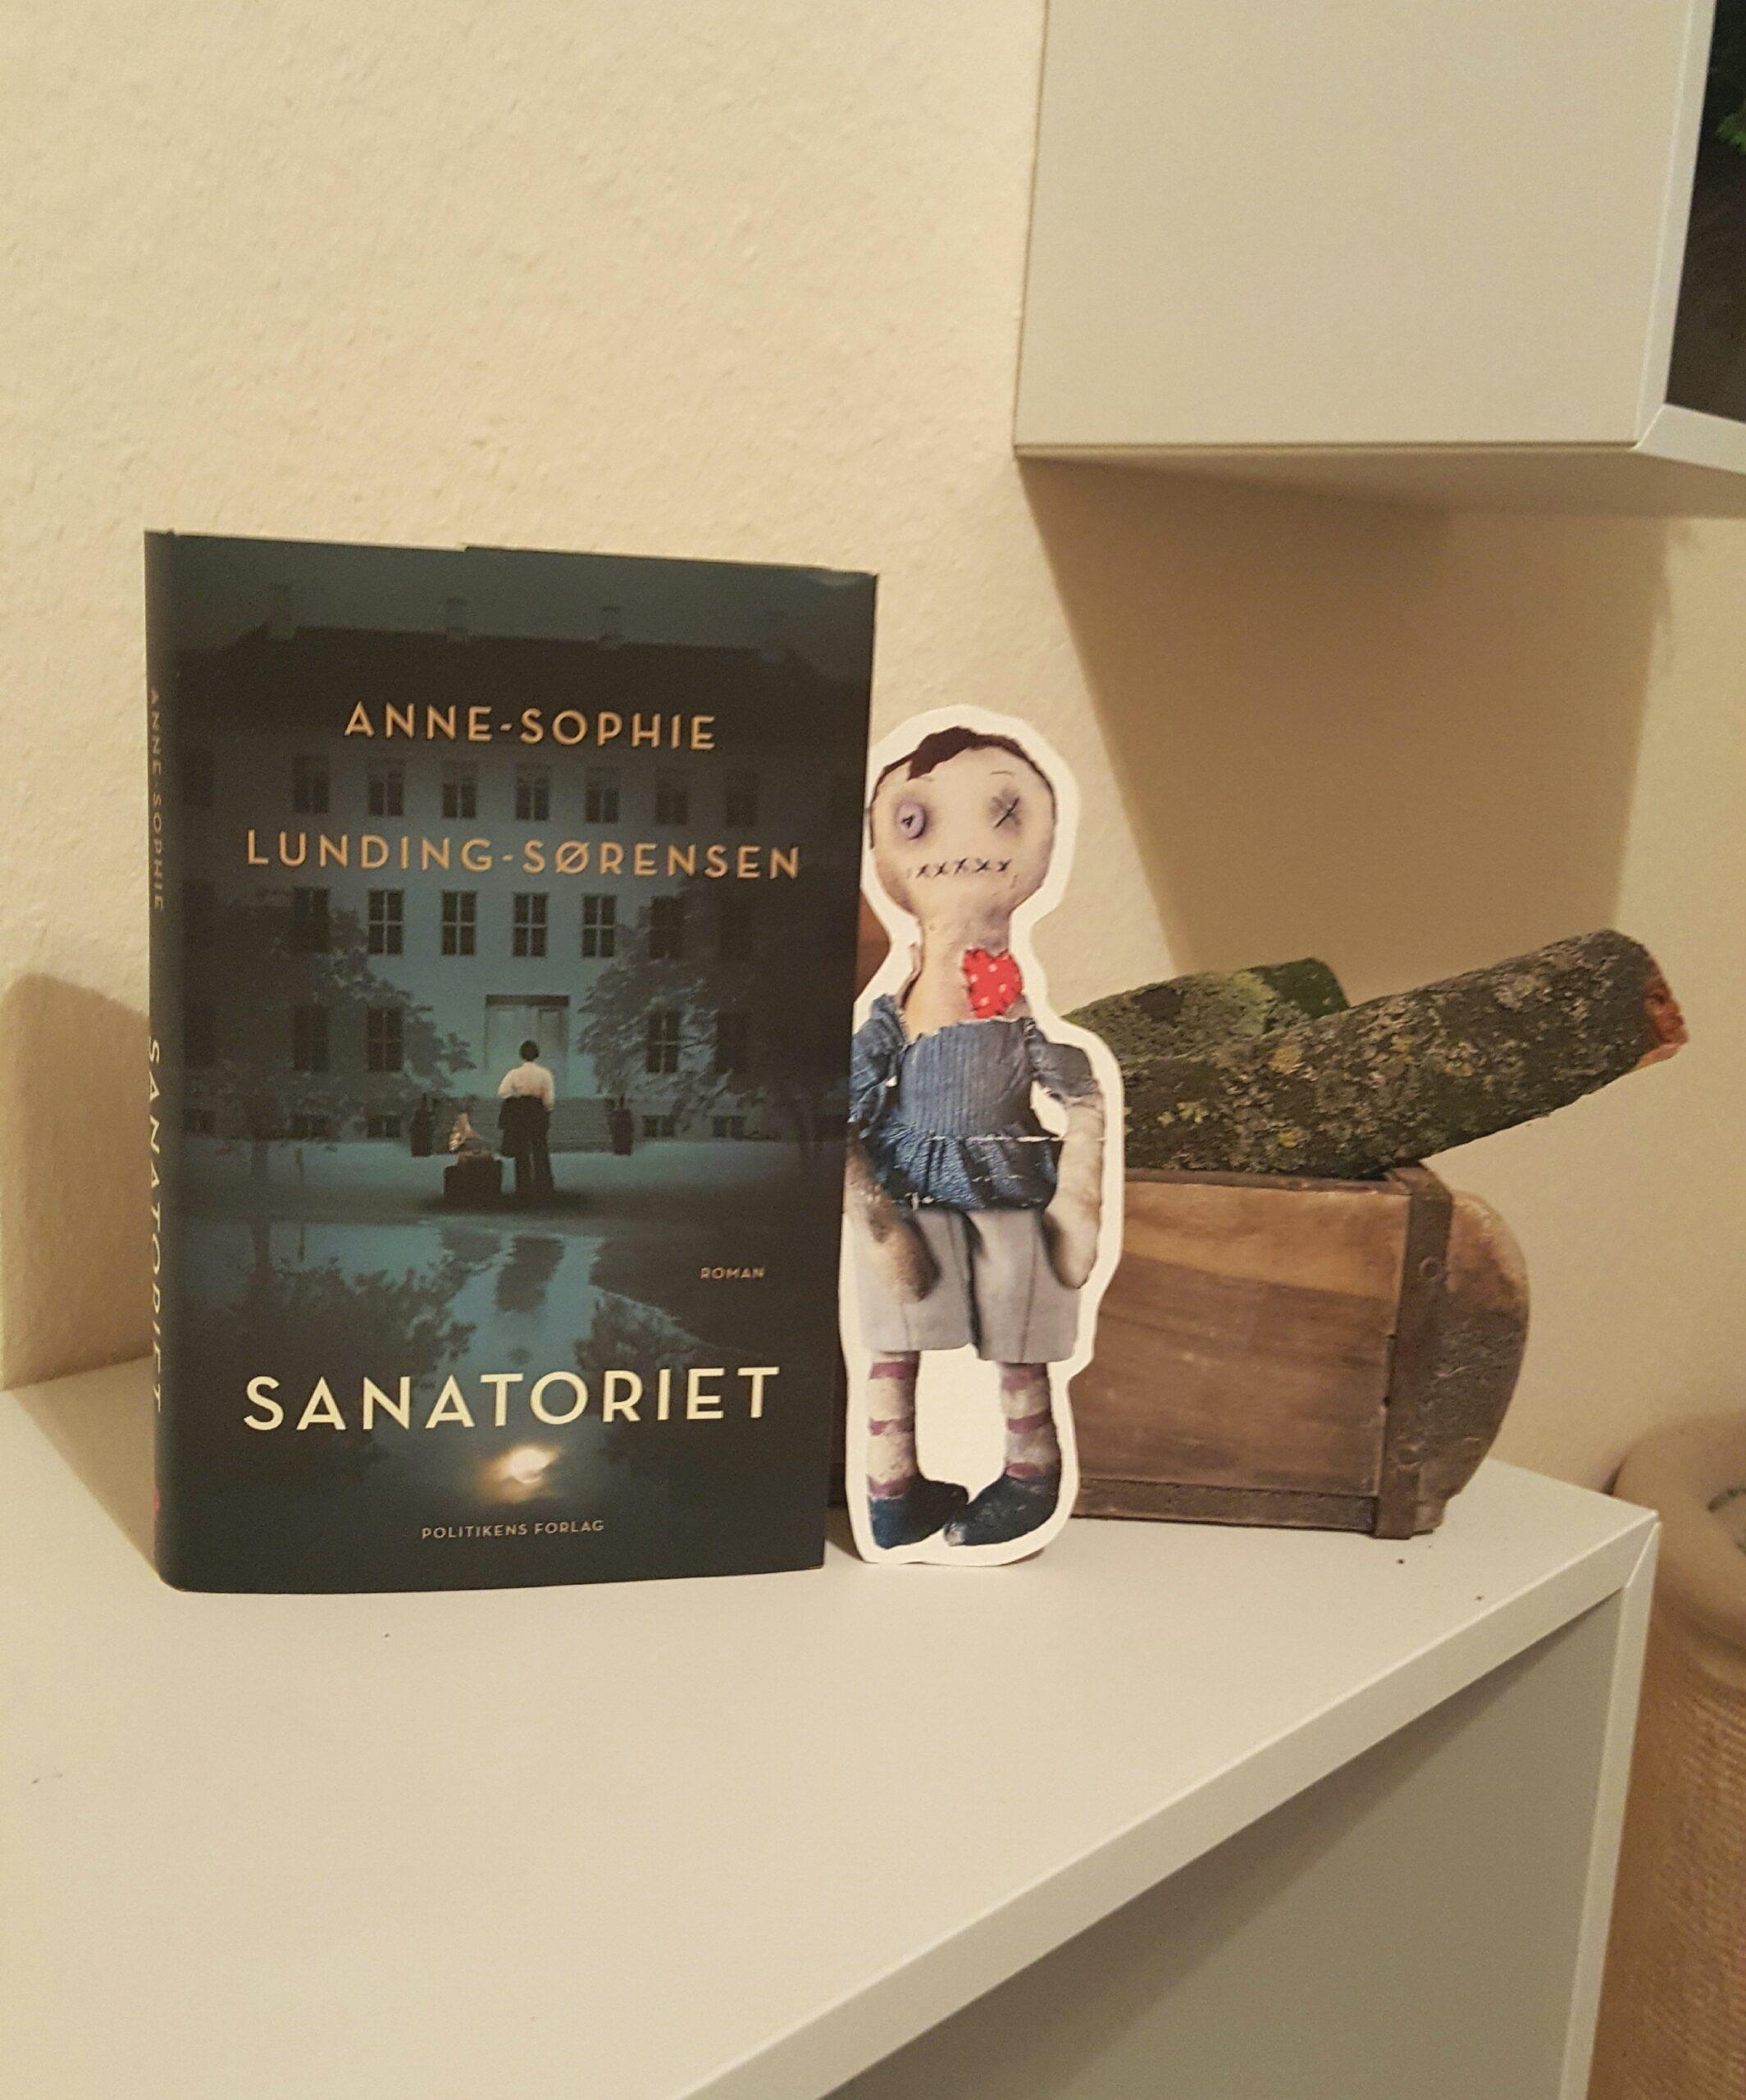 Sanatoriet af Anne-Sophie Lunding-Sørensen